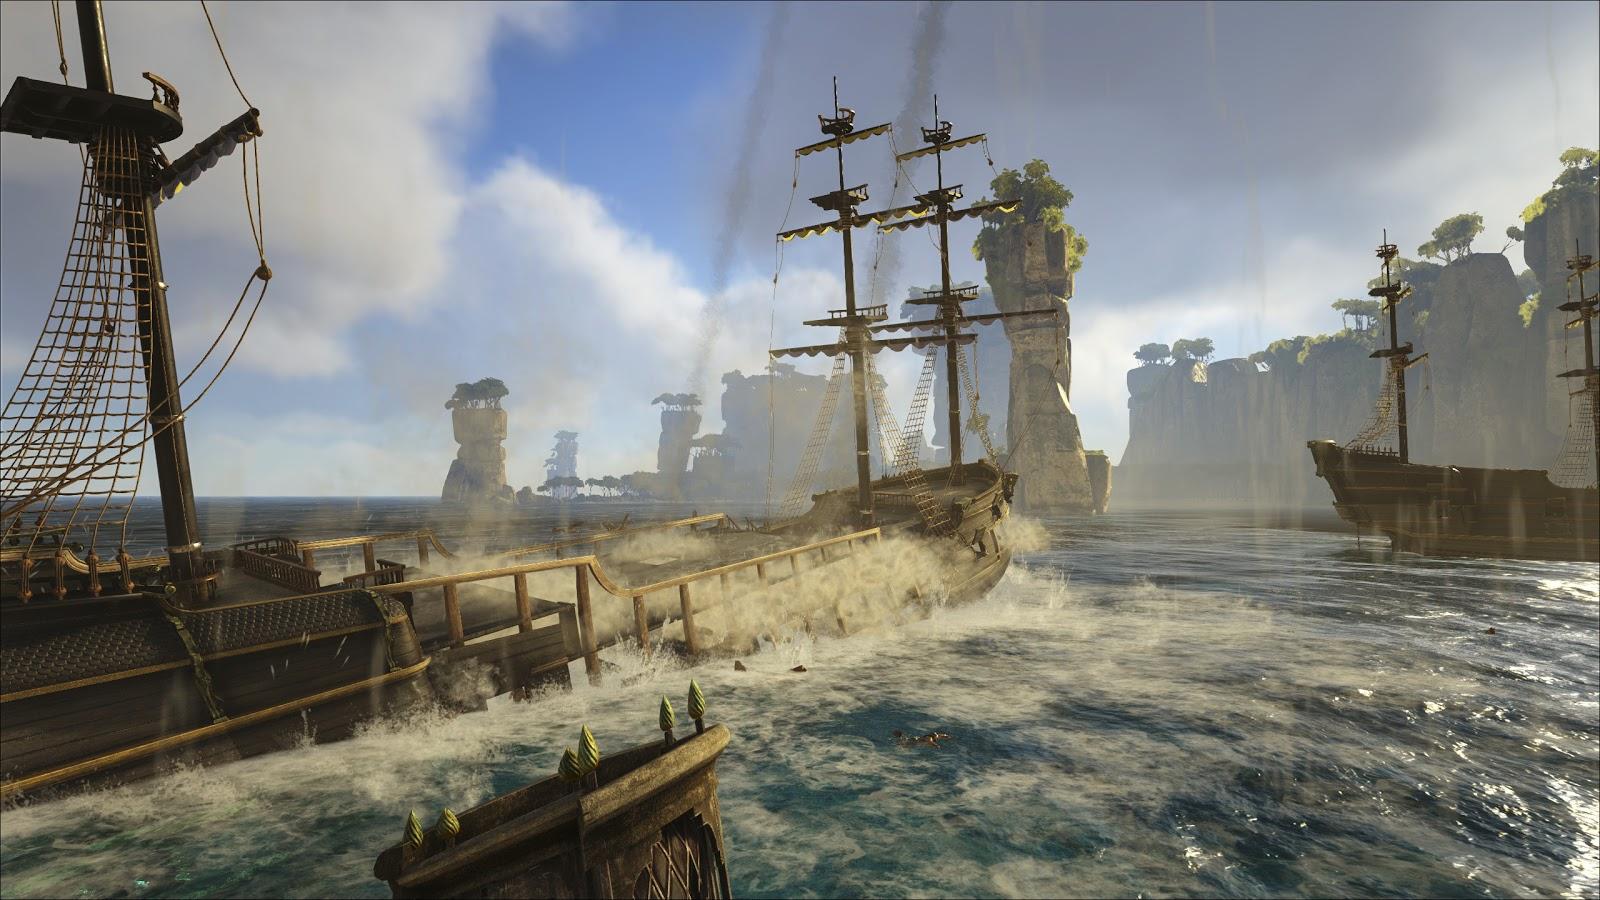 《Atlas》玩家黑入管理员帐号 鲸鱼和坦克从天而降